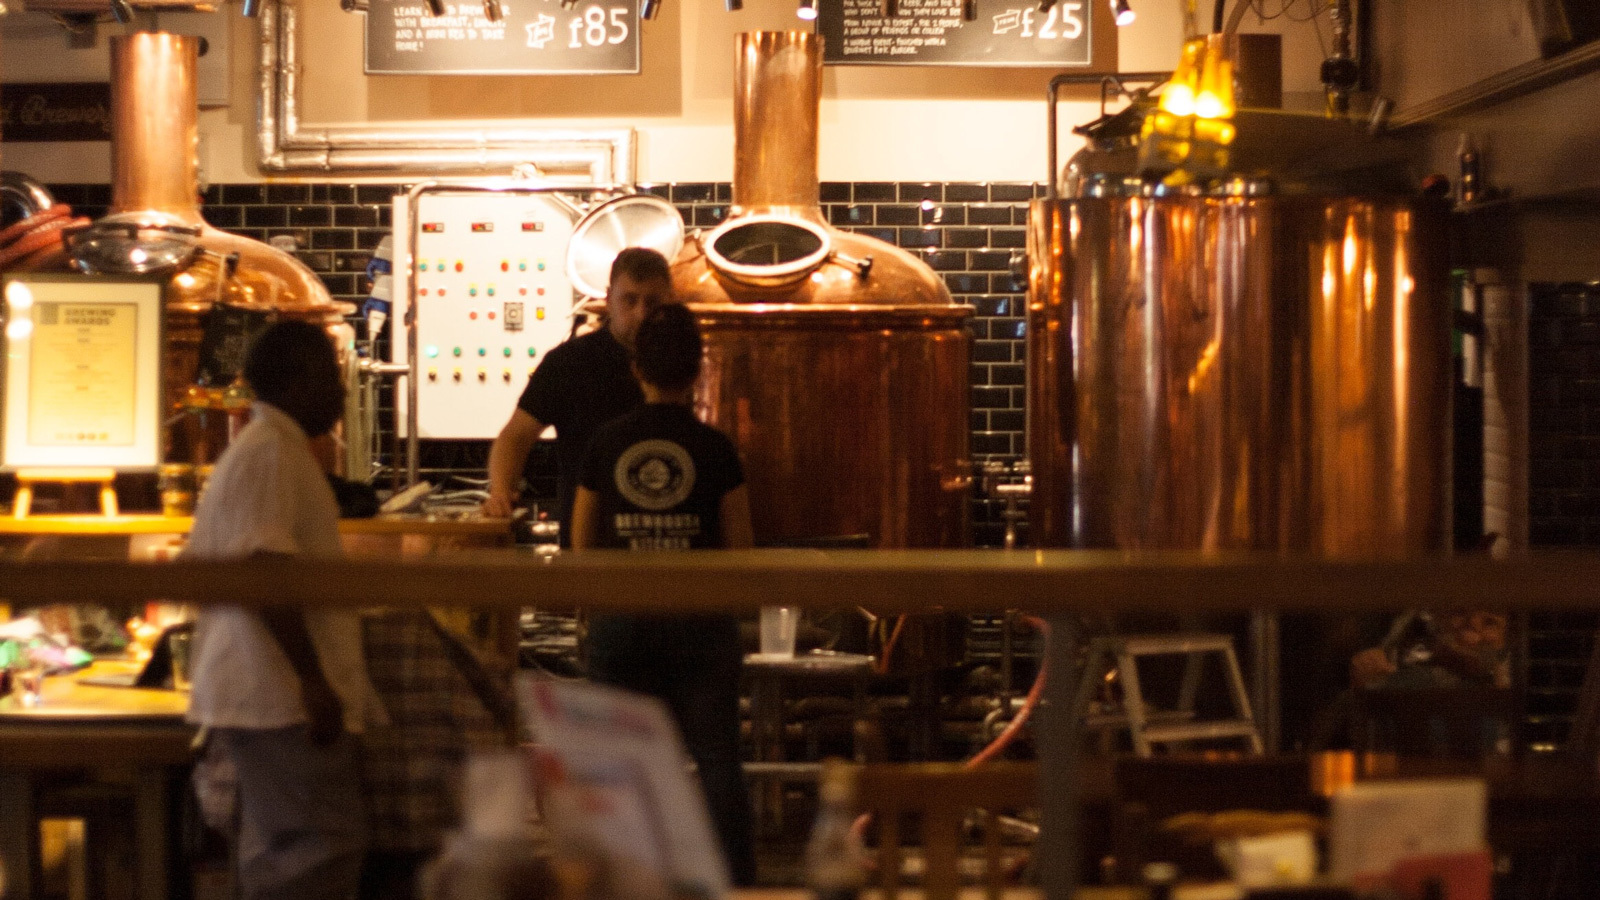 A bartender and customer sitting at a brewery bar